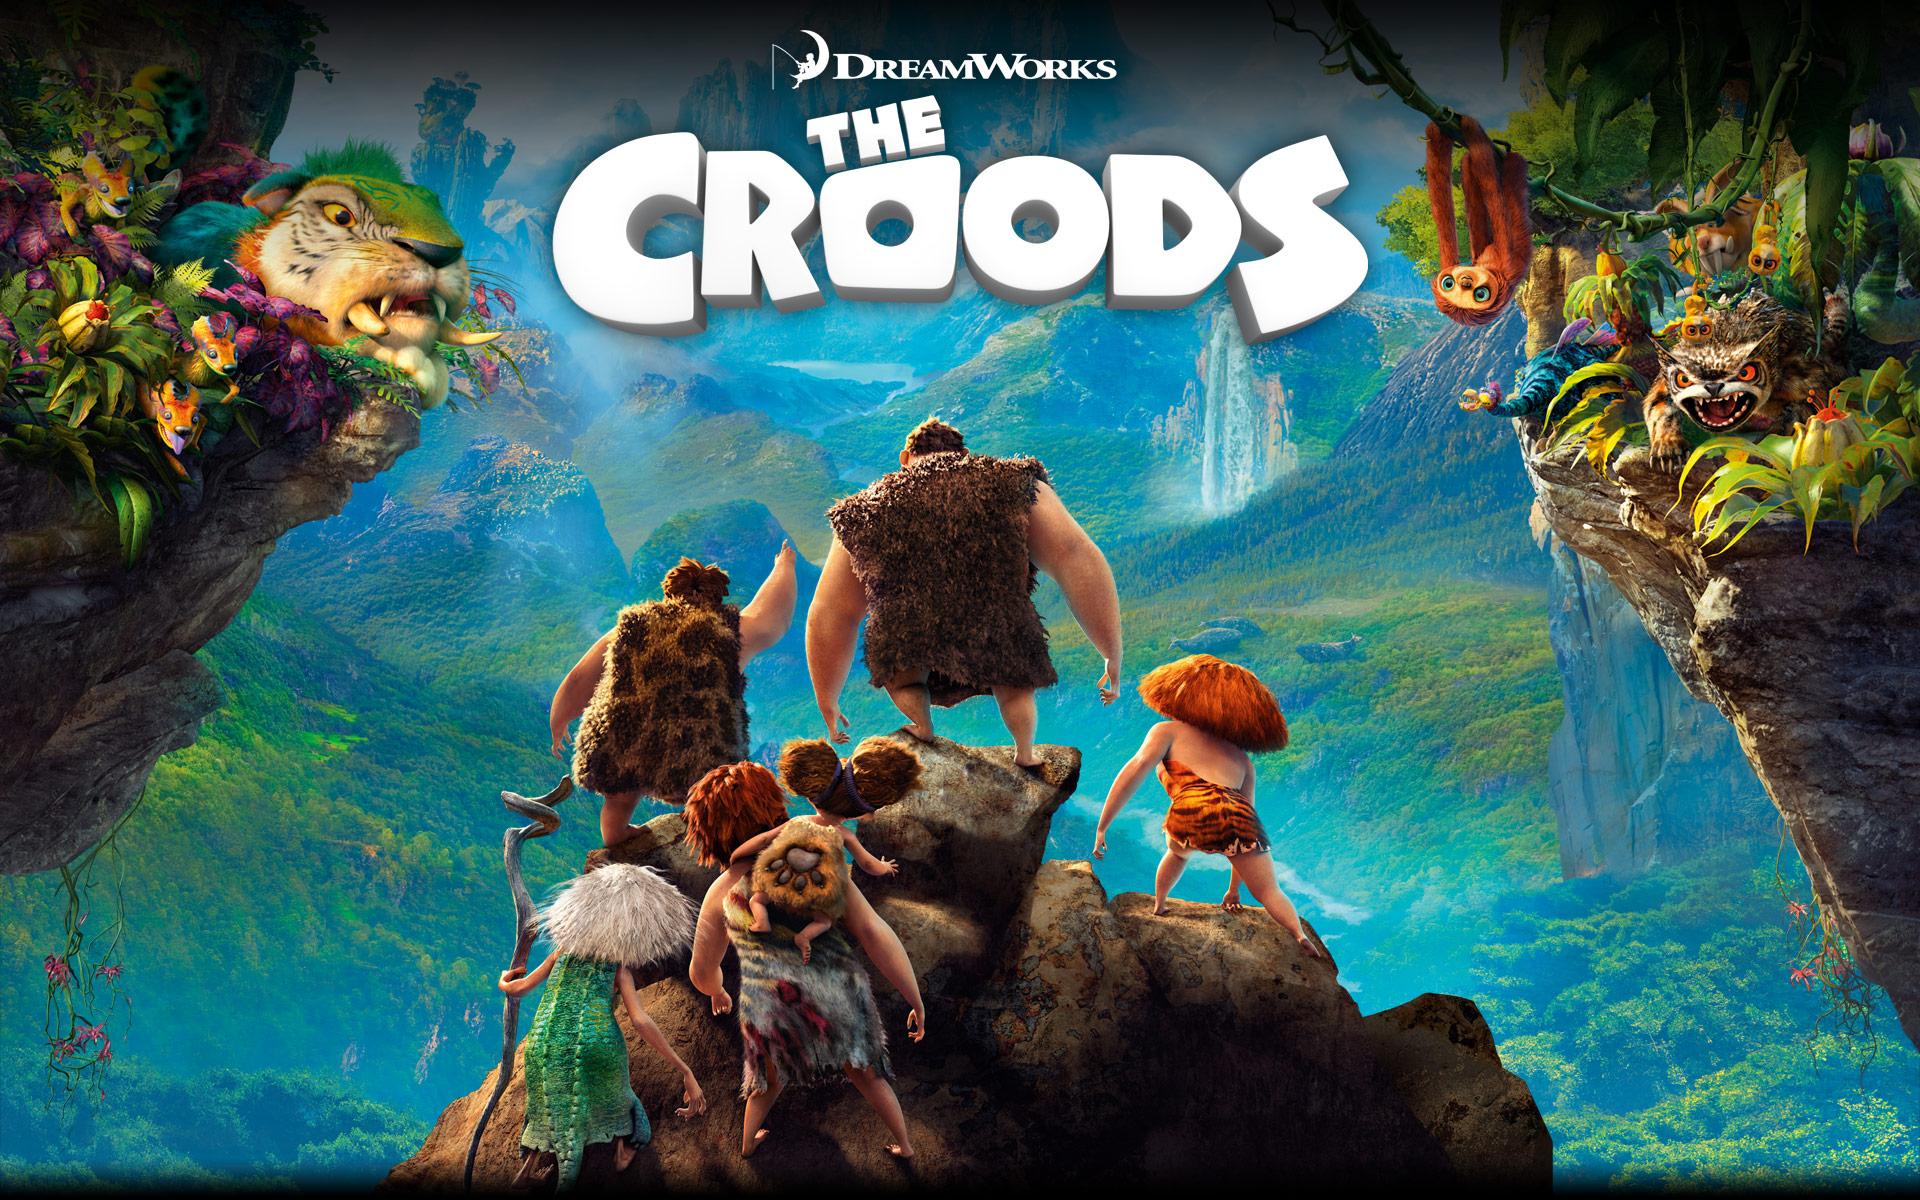 The Croods (2013) [Movie]